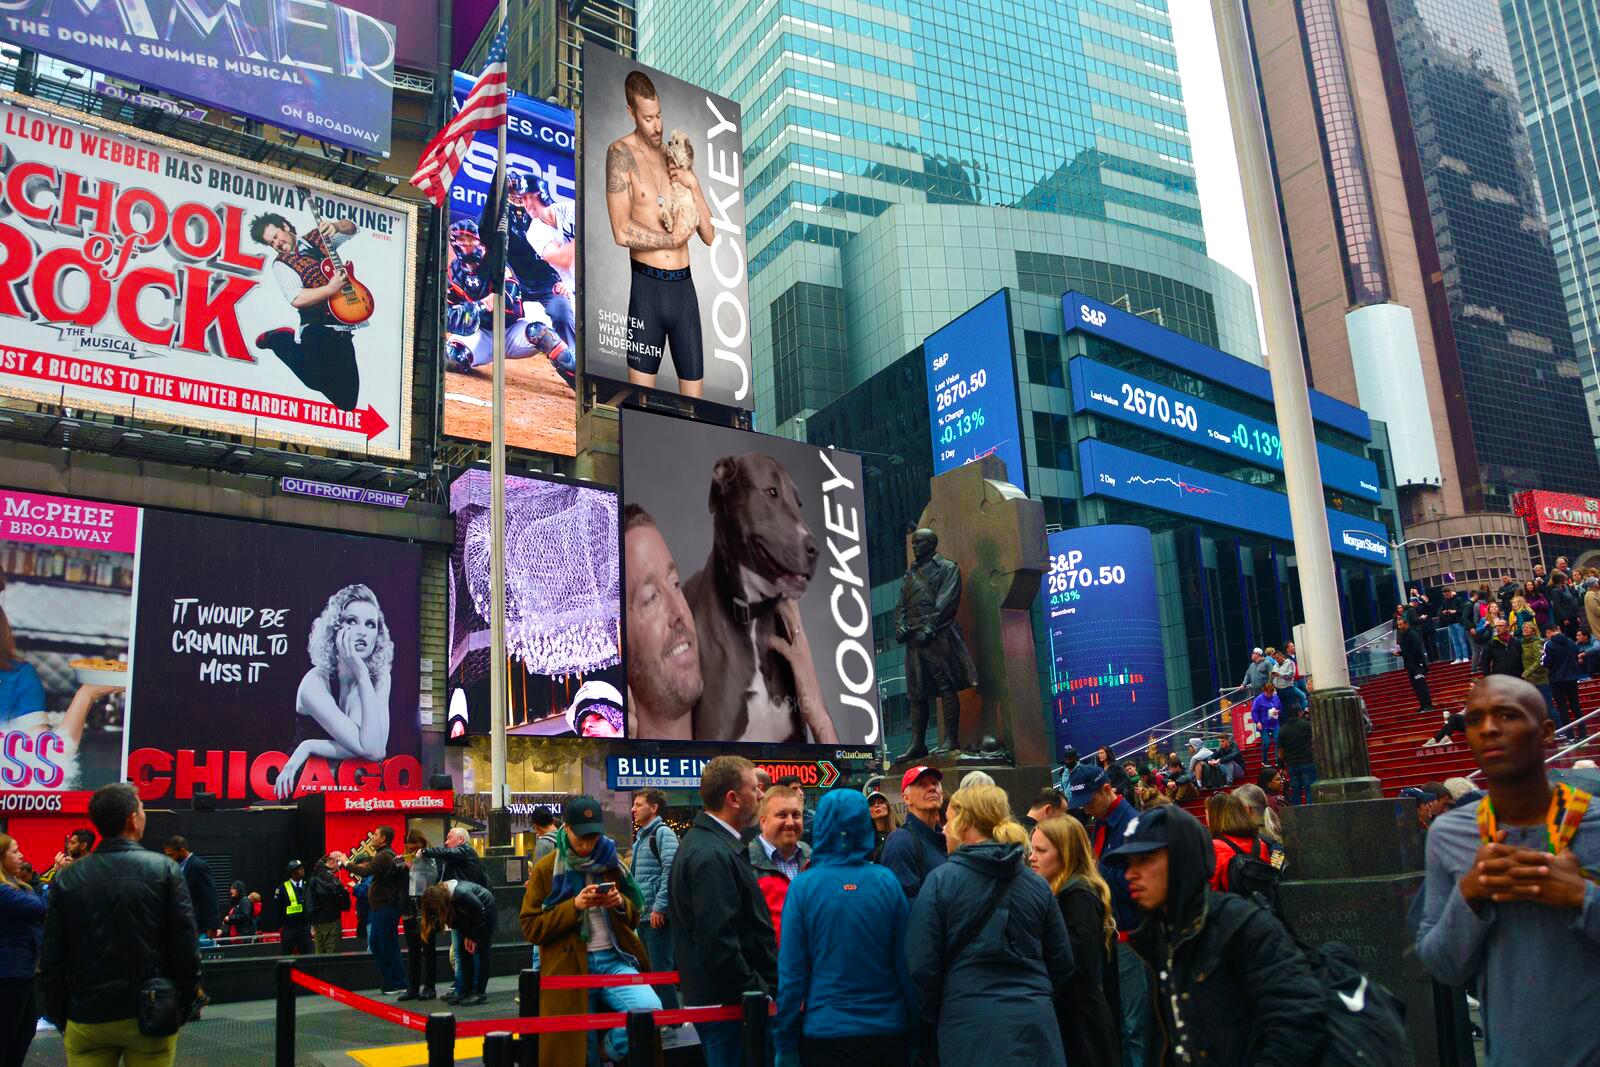 ShowEm_Hero_Victoria_Arlen_on_Times_Square_Digital_Billboards_May_2018 copy.jpg